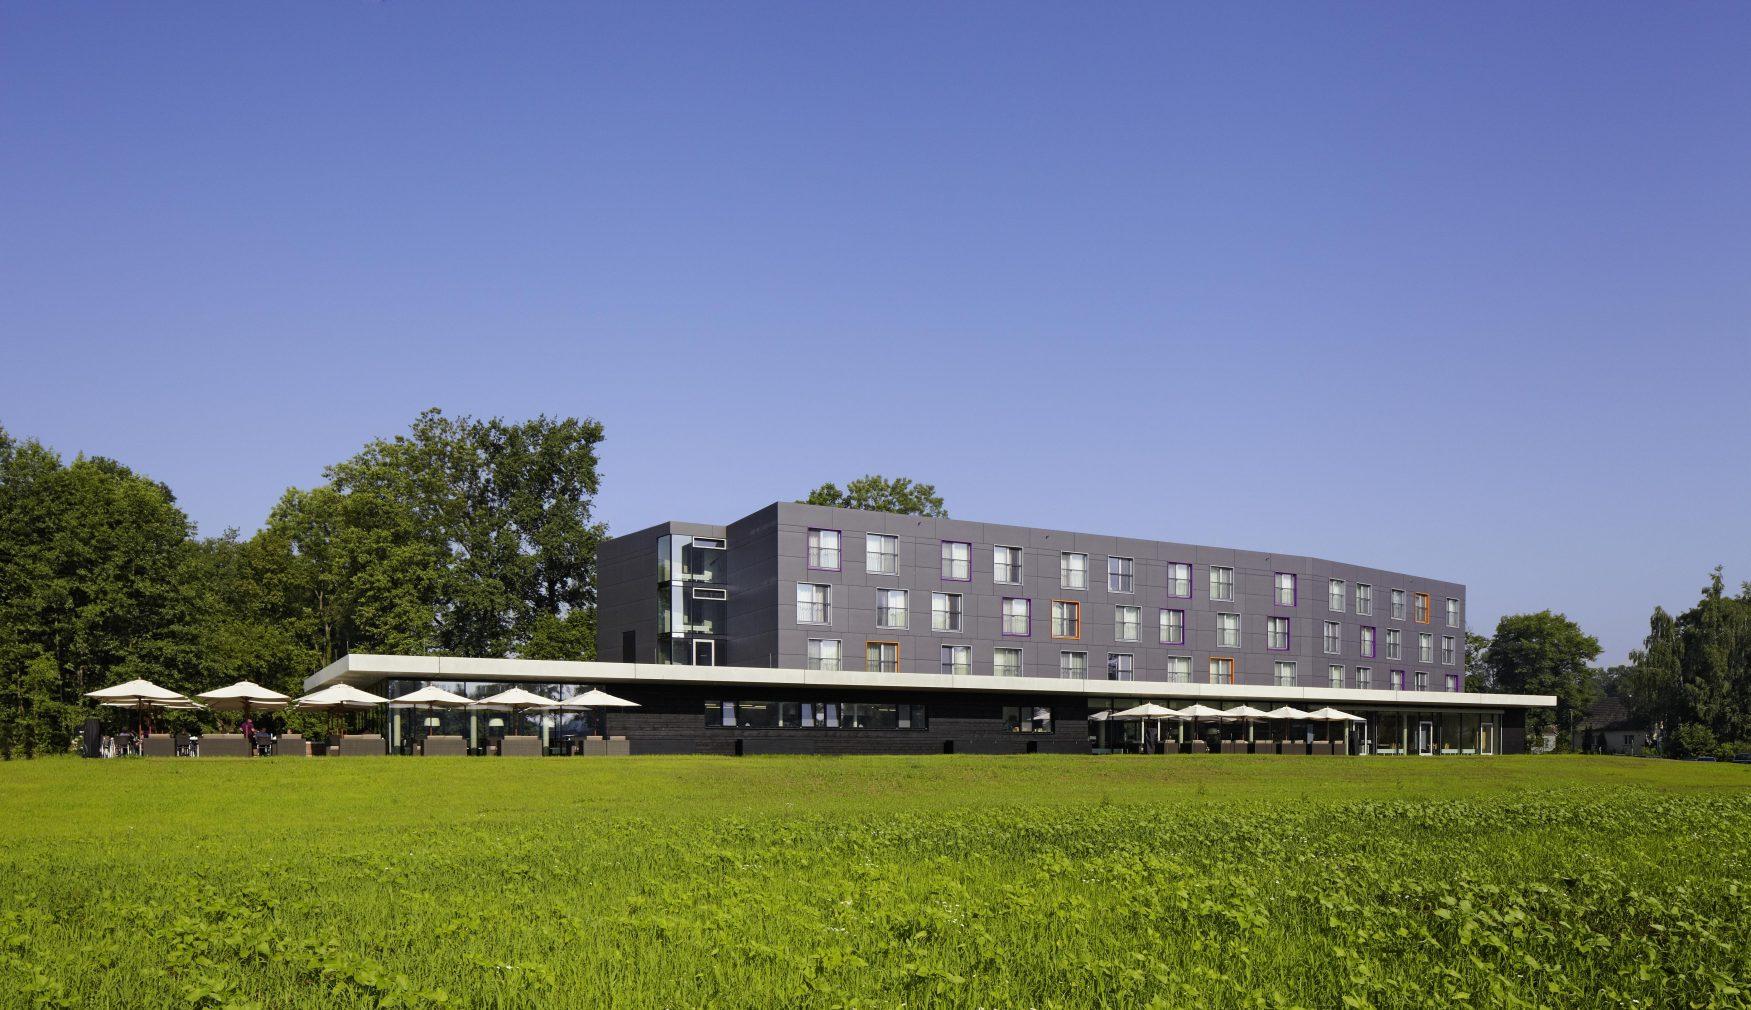 Blick auf das Thermenhotel Foto: Spreewald Therme GmbH